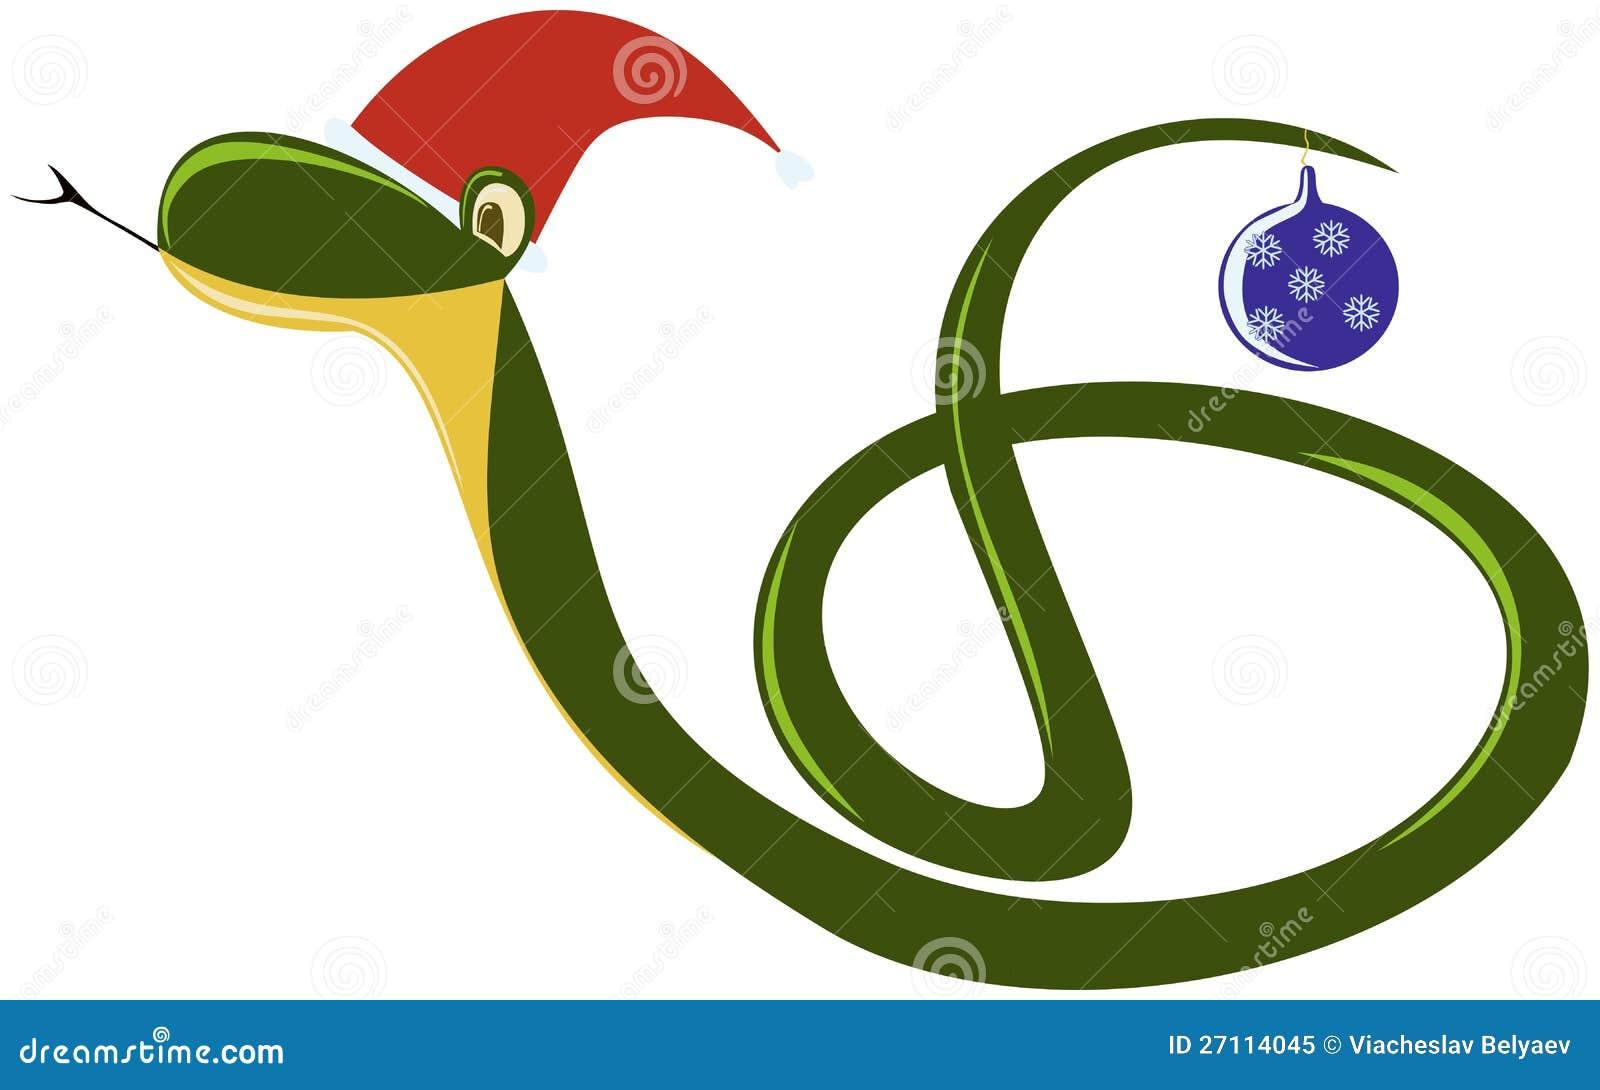 Green snake cartoon royalty free stock image image 19462406 - Funny Snake Royalty Free Stock Photo Image 27114045